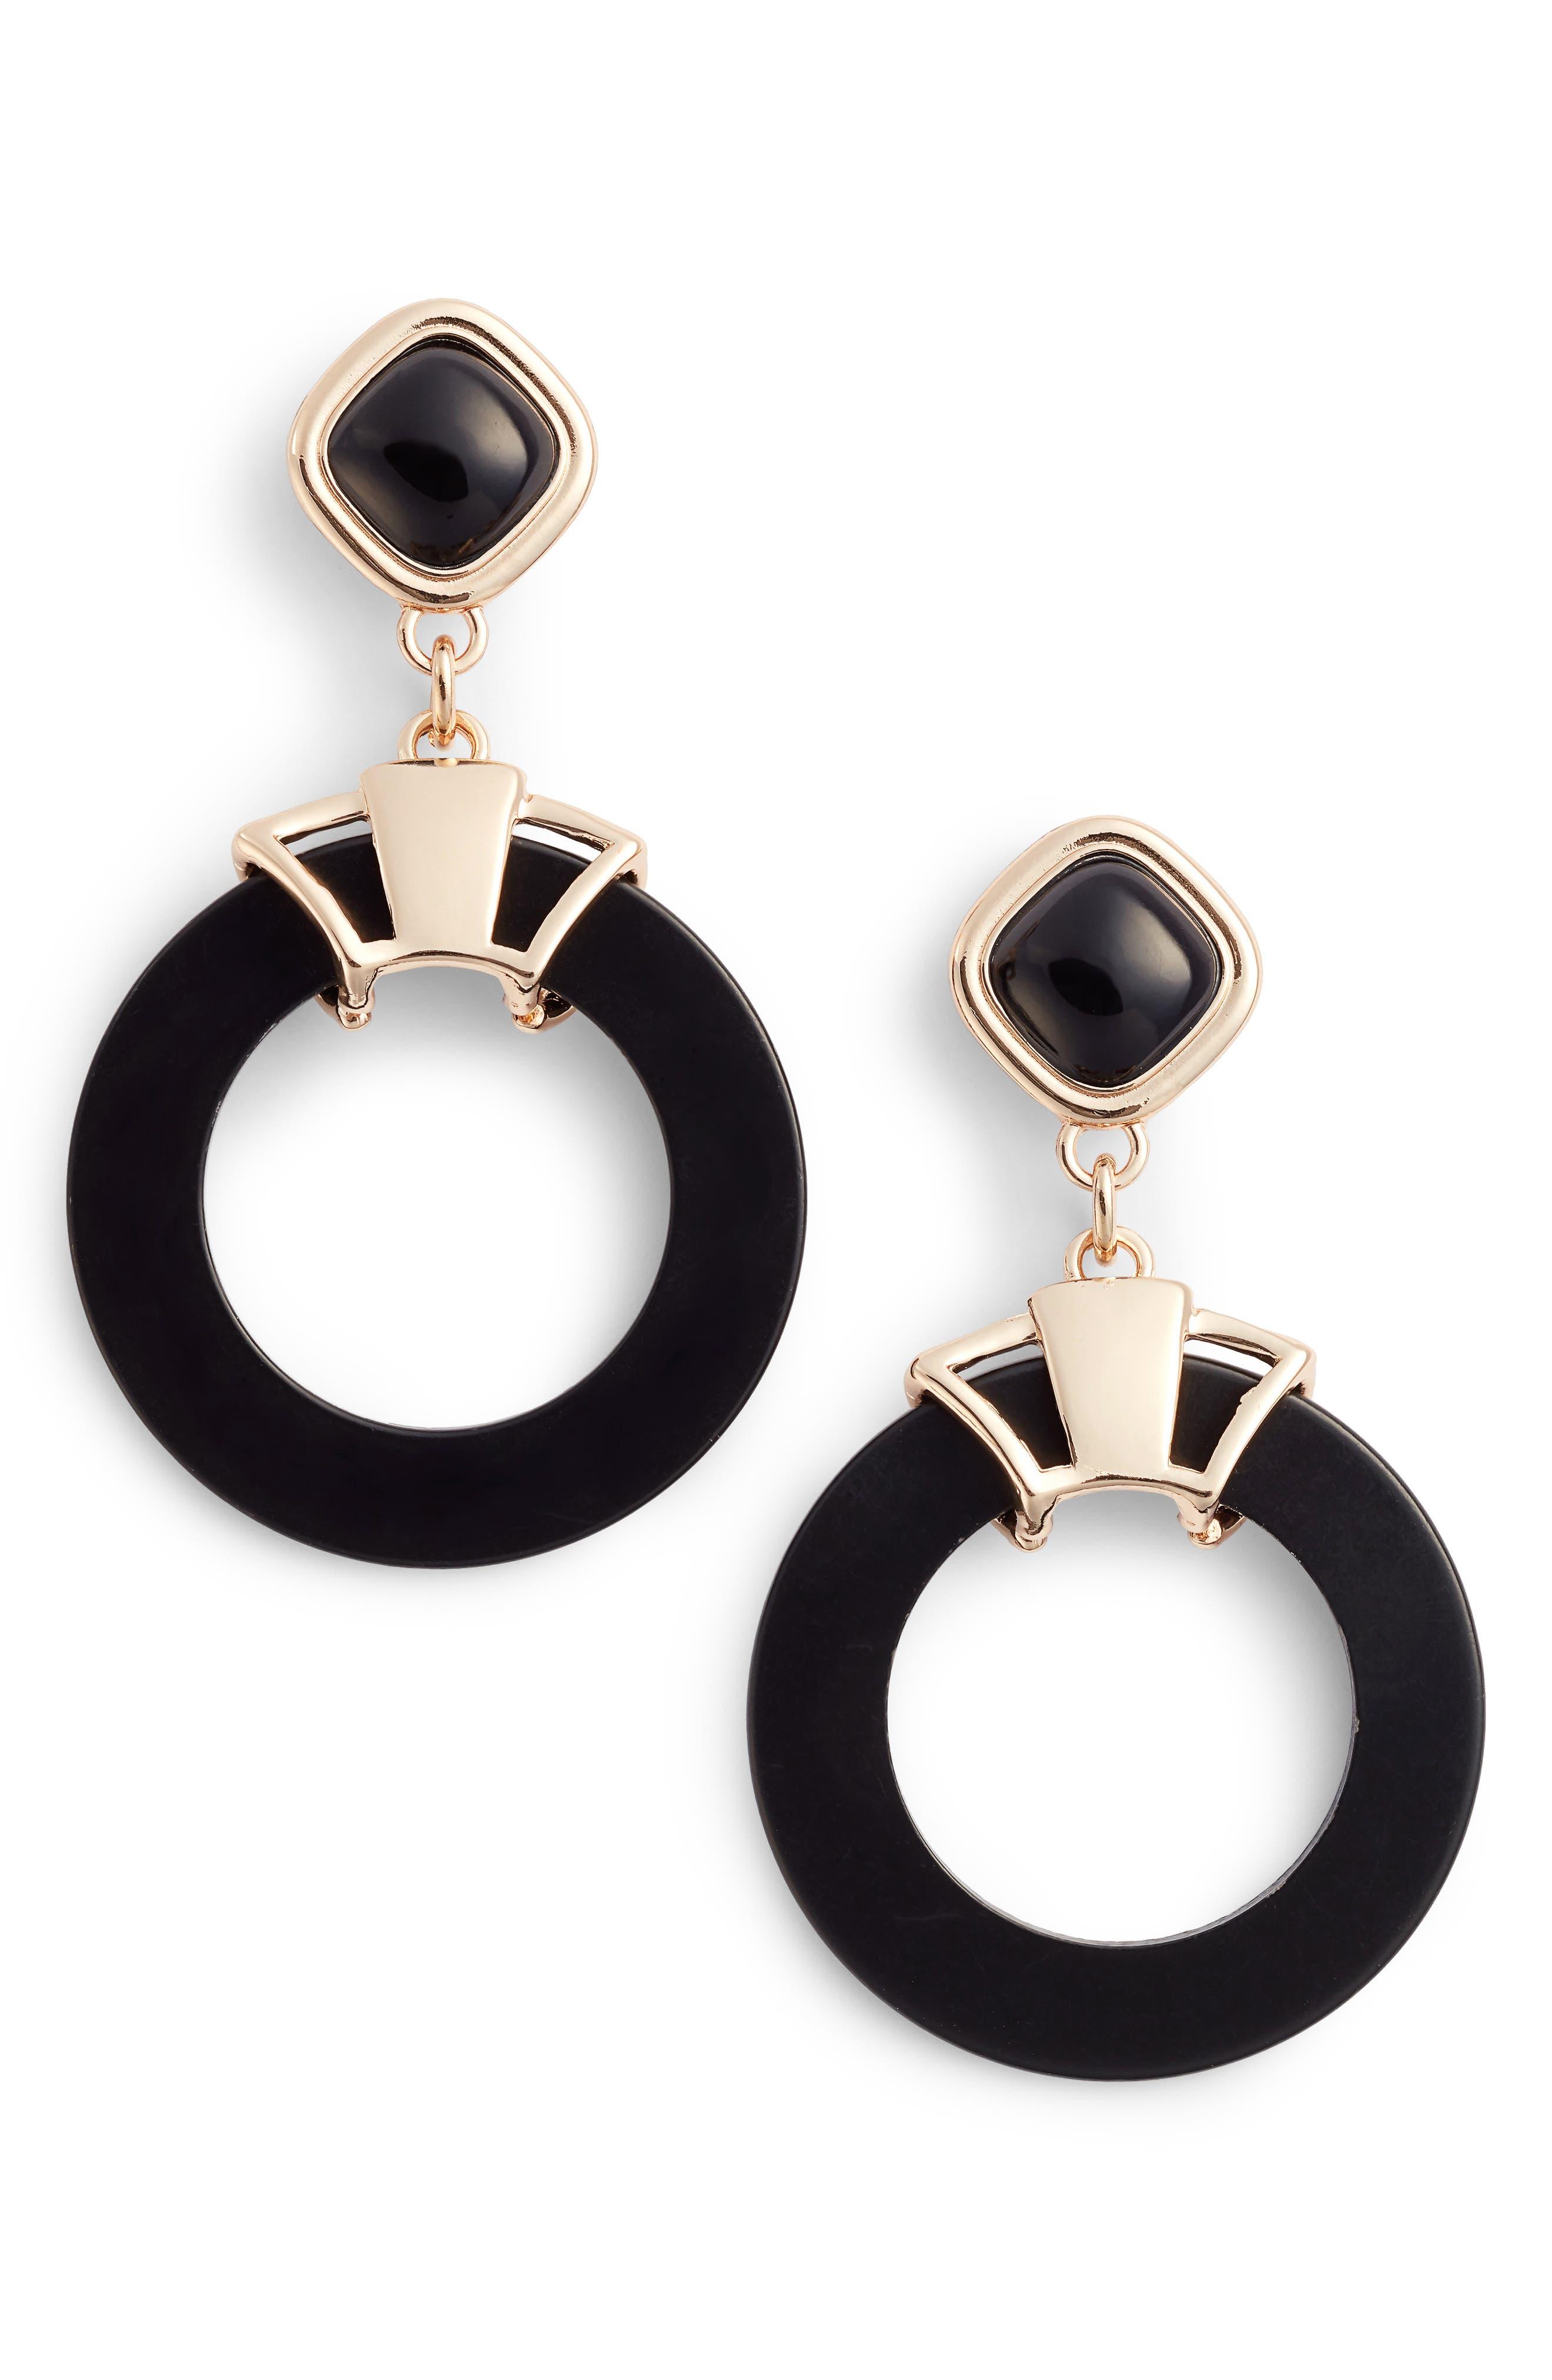 Stone Circle Earrings,                             Main thumbnail 1, color,                             001